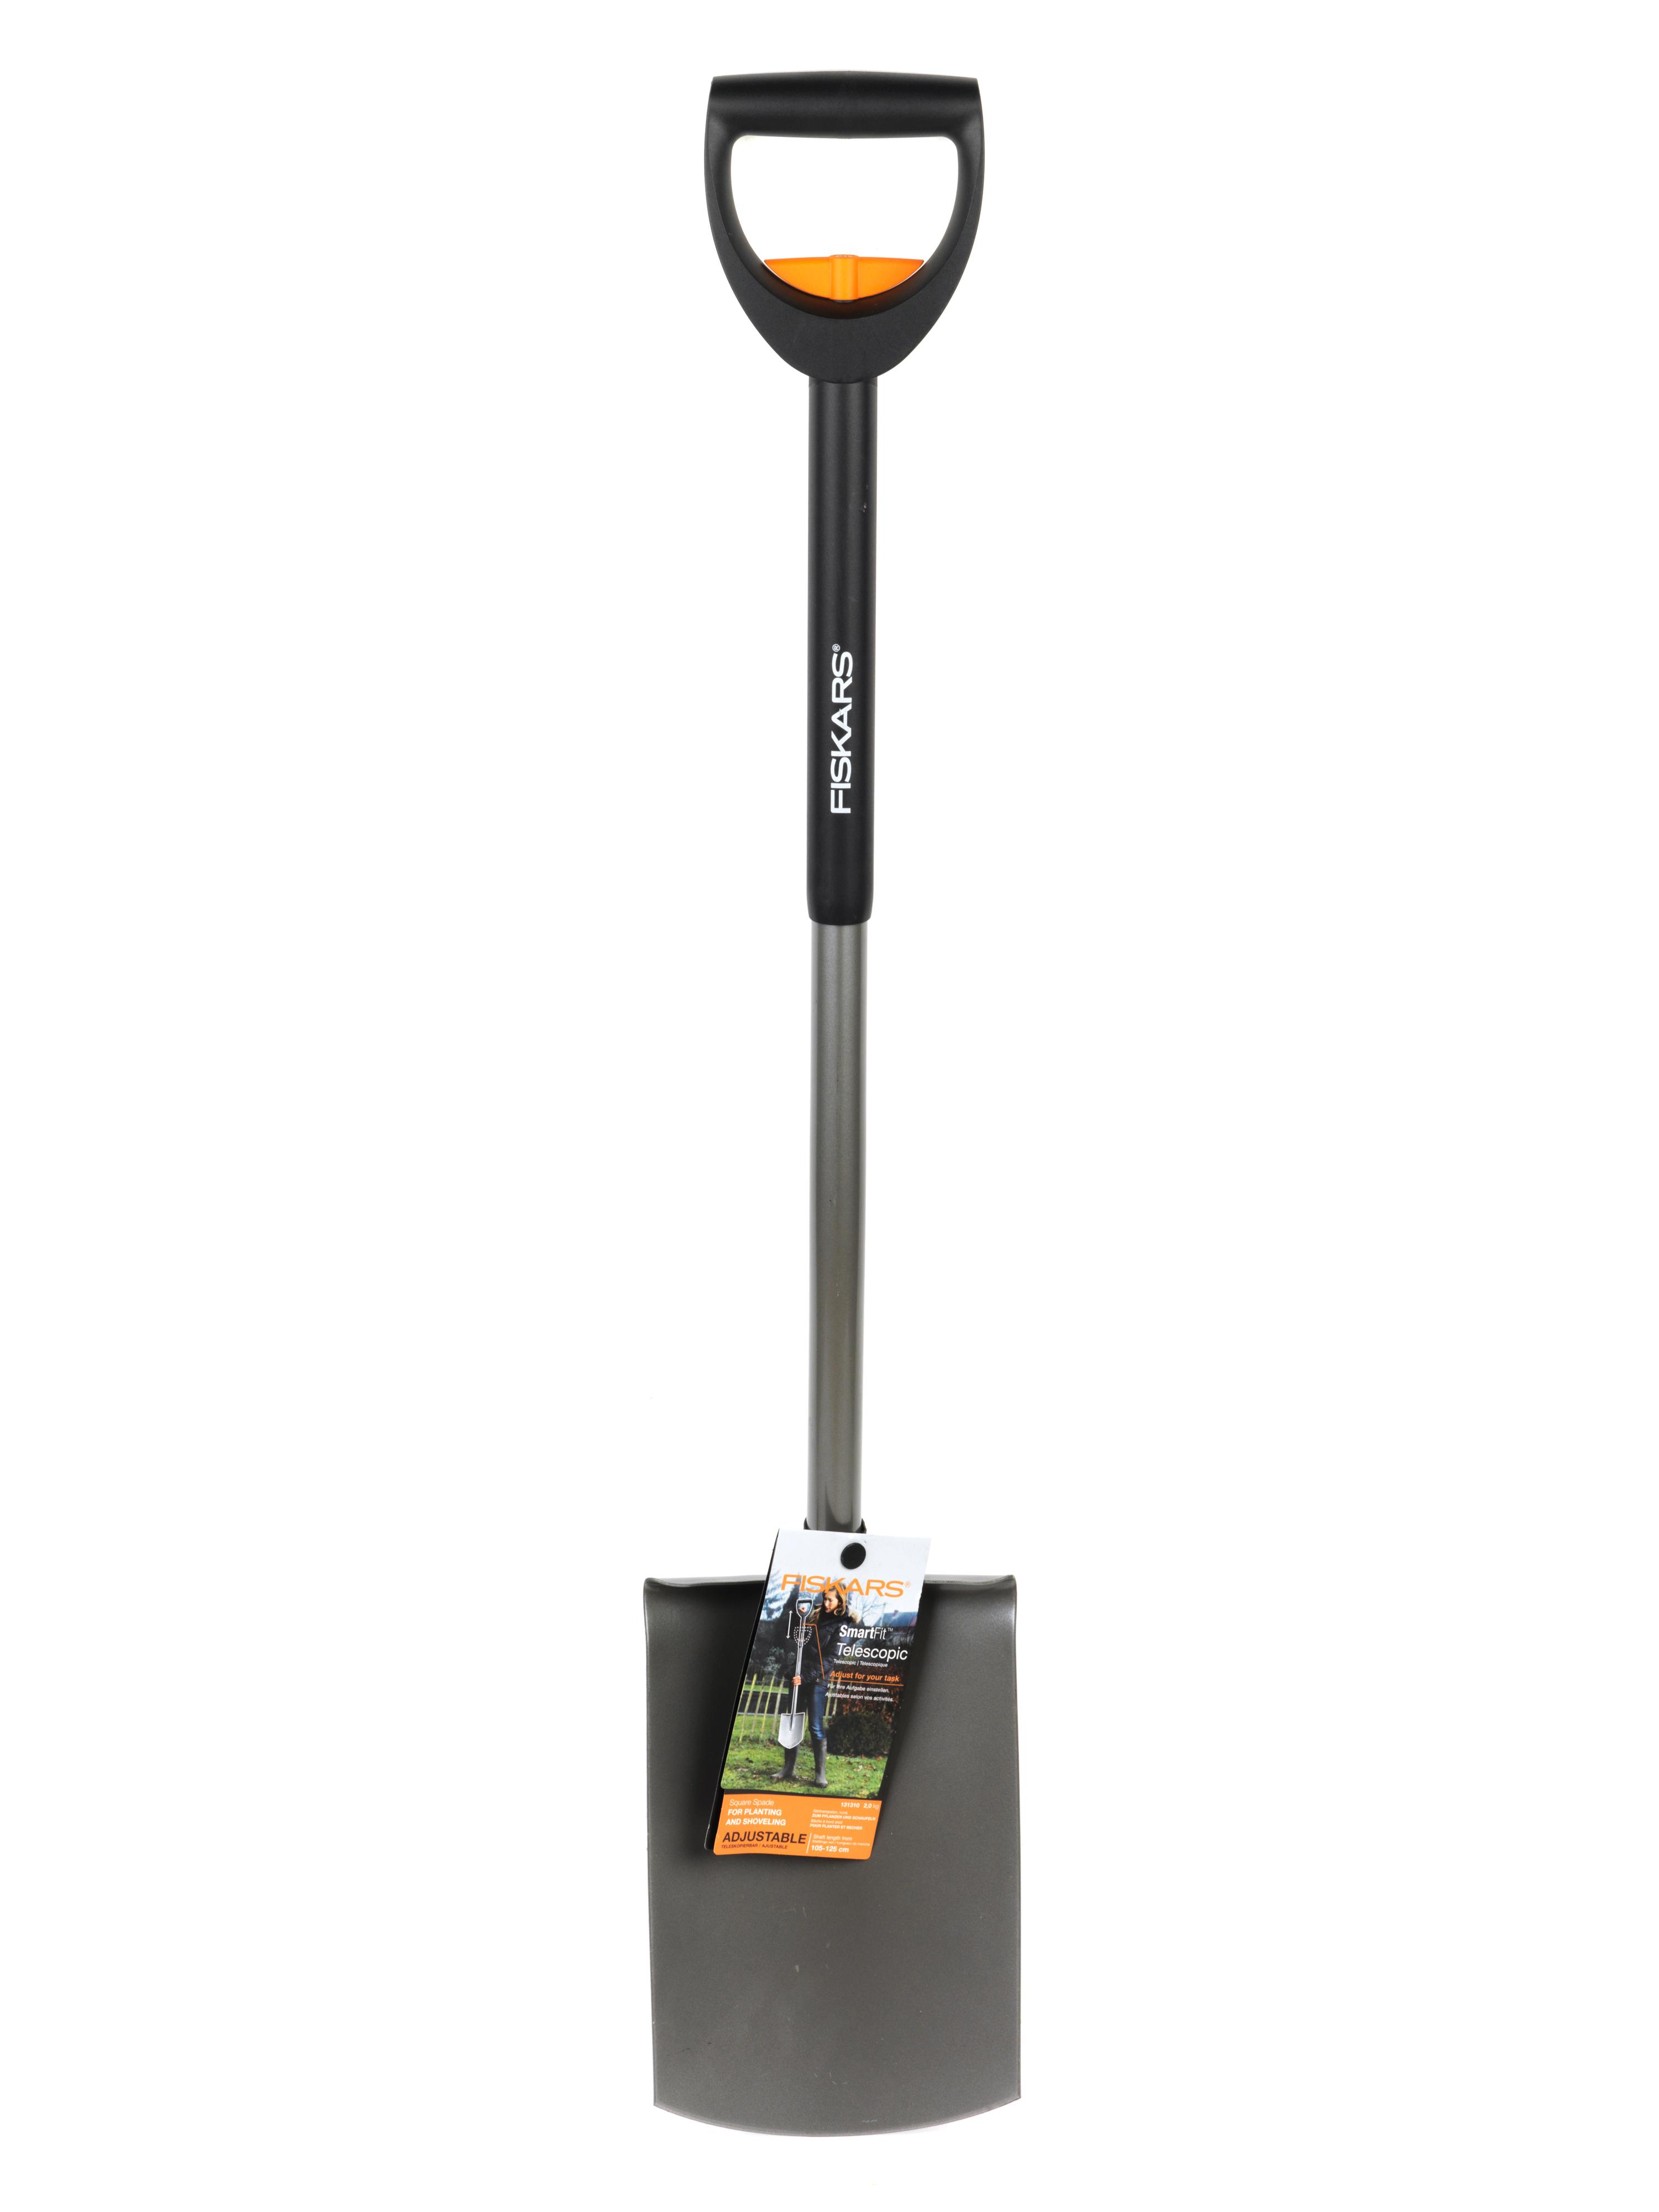 Ny Fiskars 1000620 Smart-Fit Rounded Garden Spade | No1Brands4You FS31